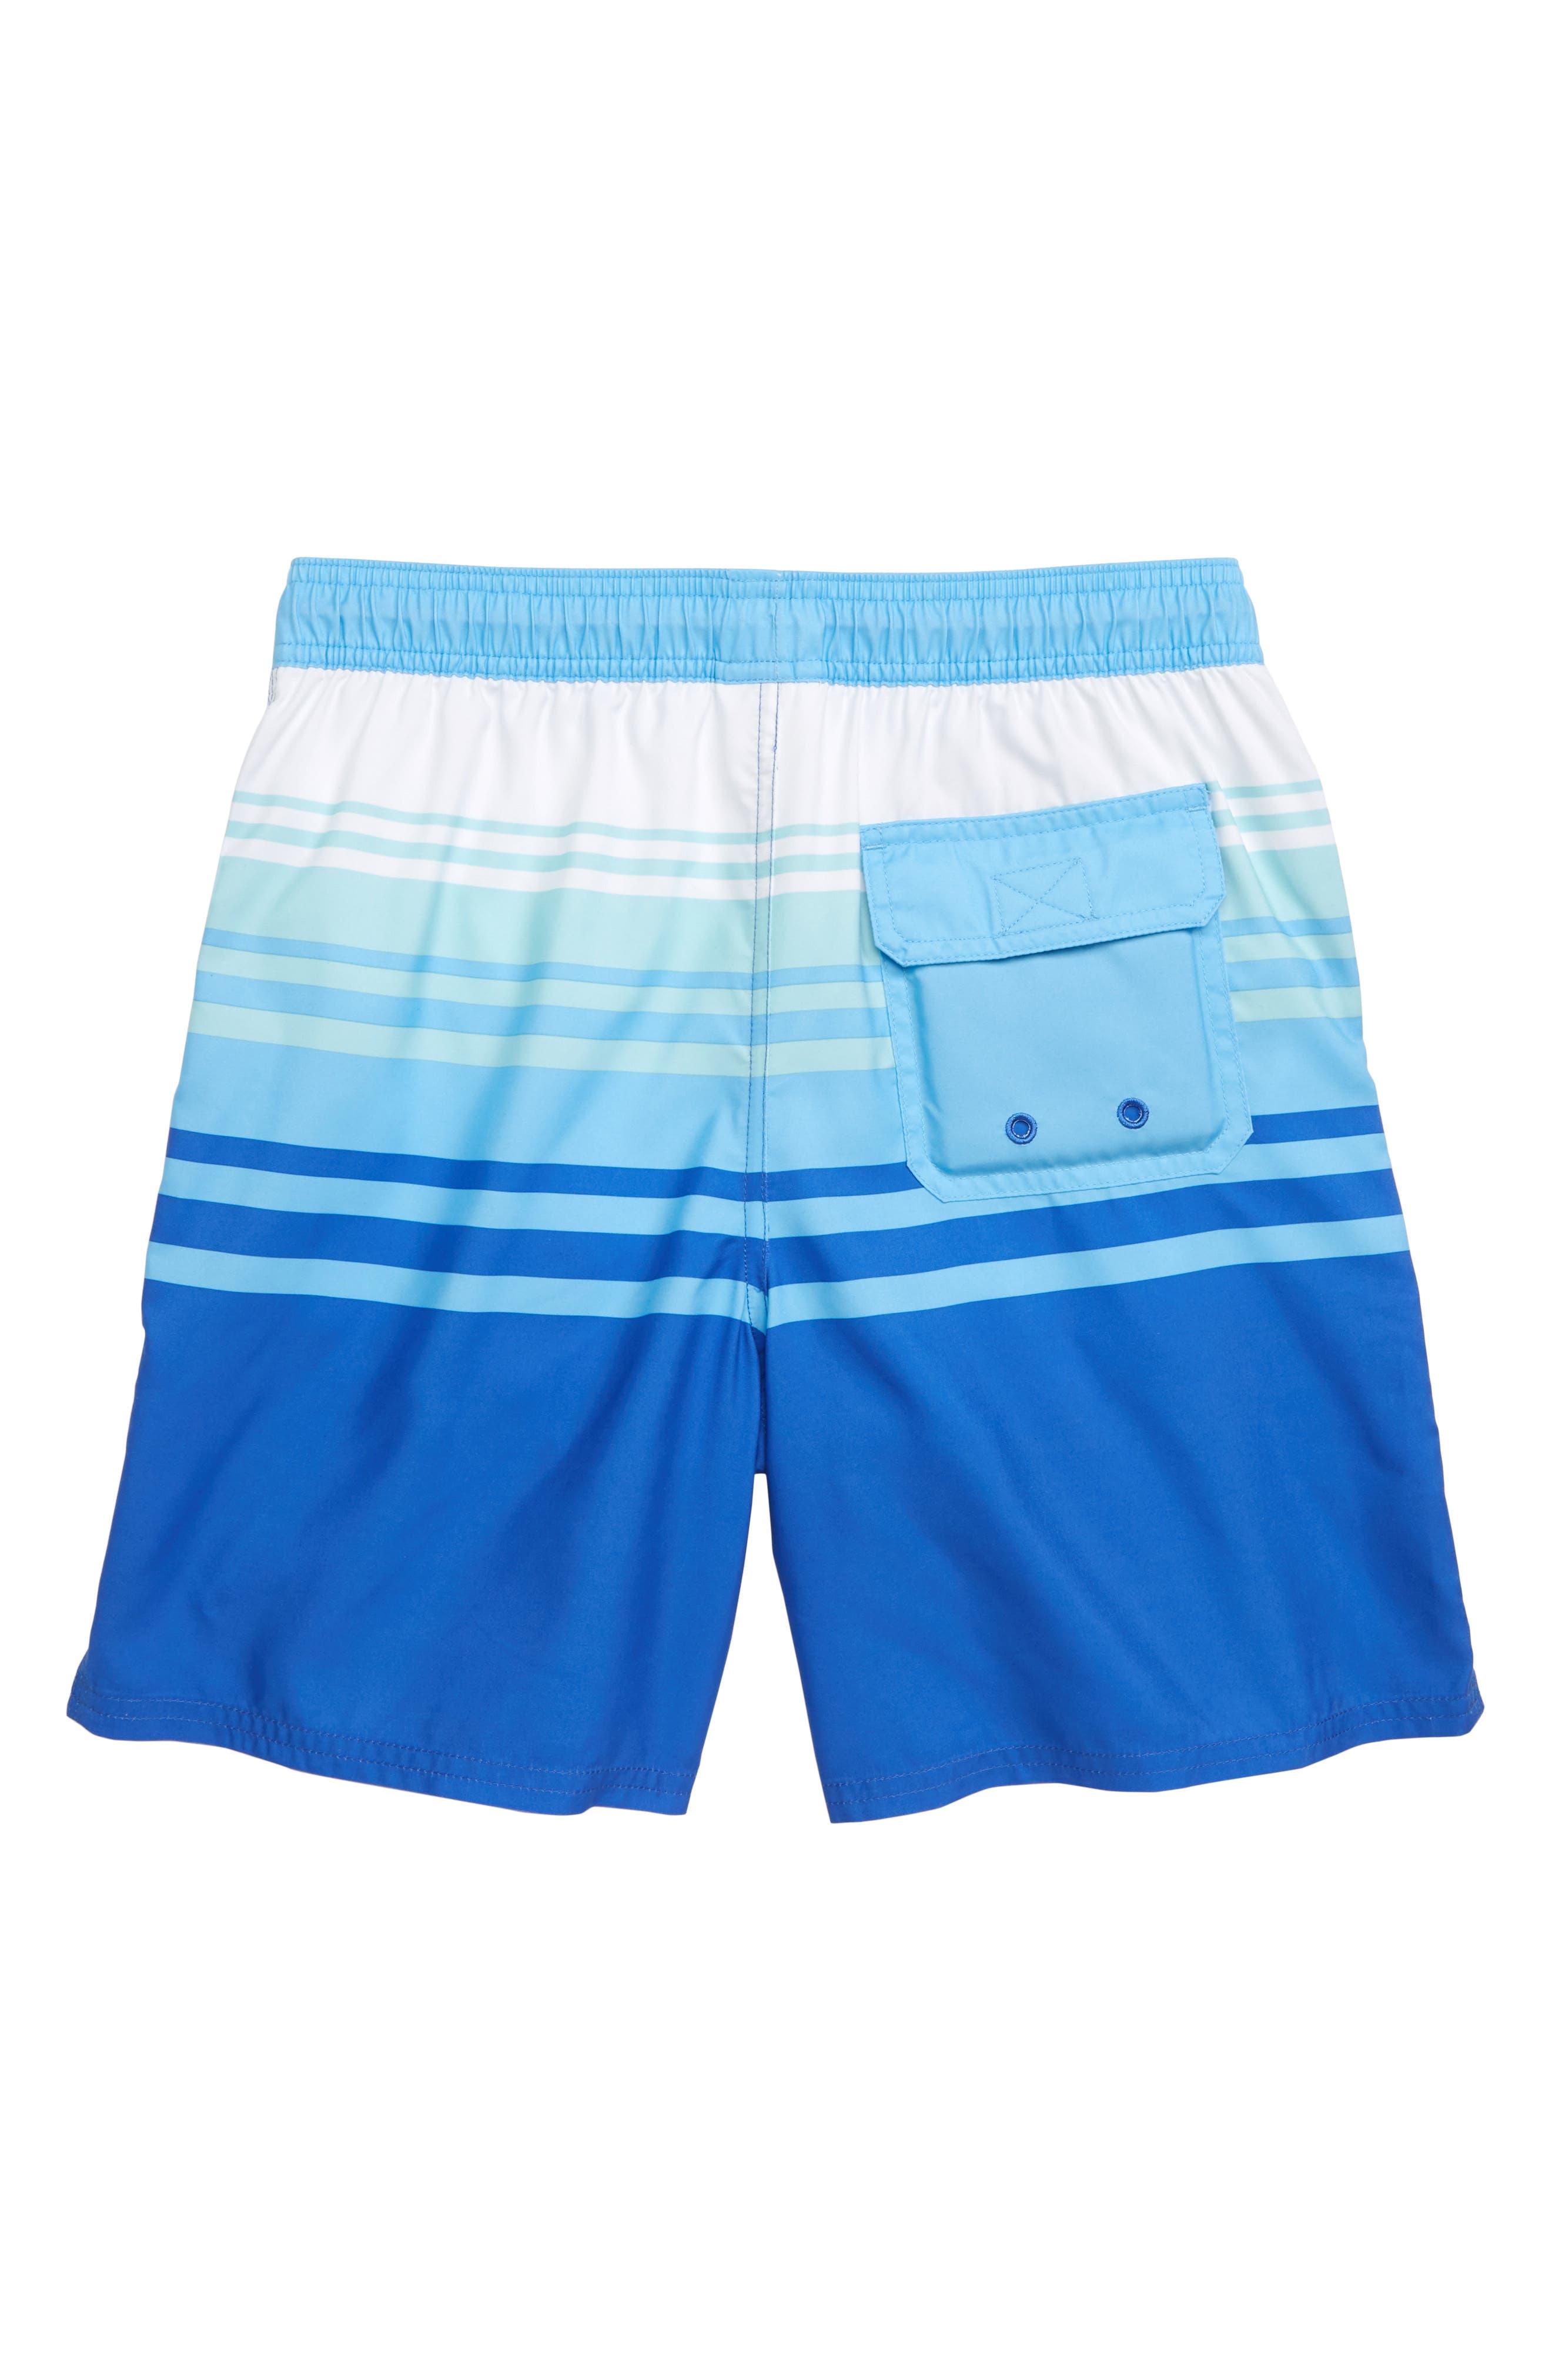 Dusk Stripe Chappy Swim Trunks,                             Alternate thumbnail 2, color,                             500